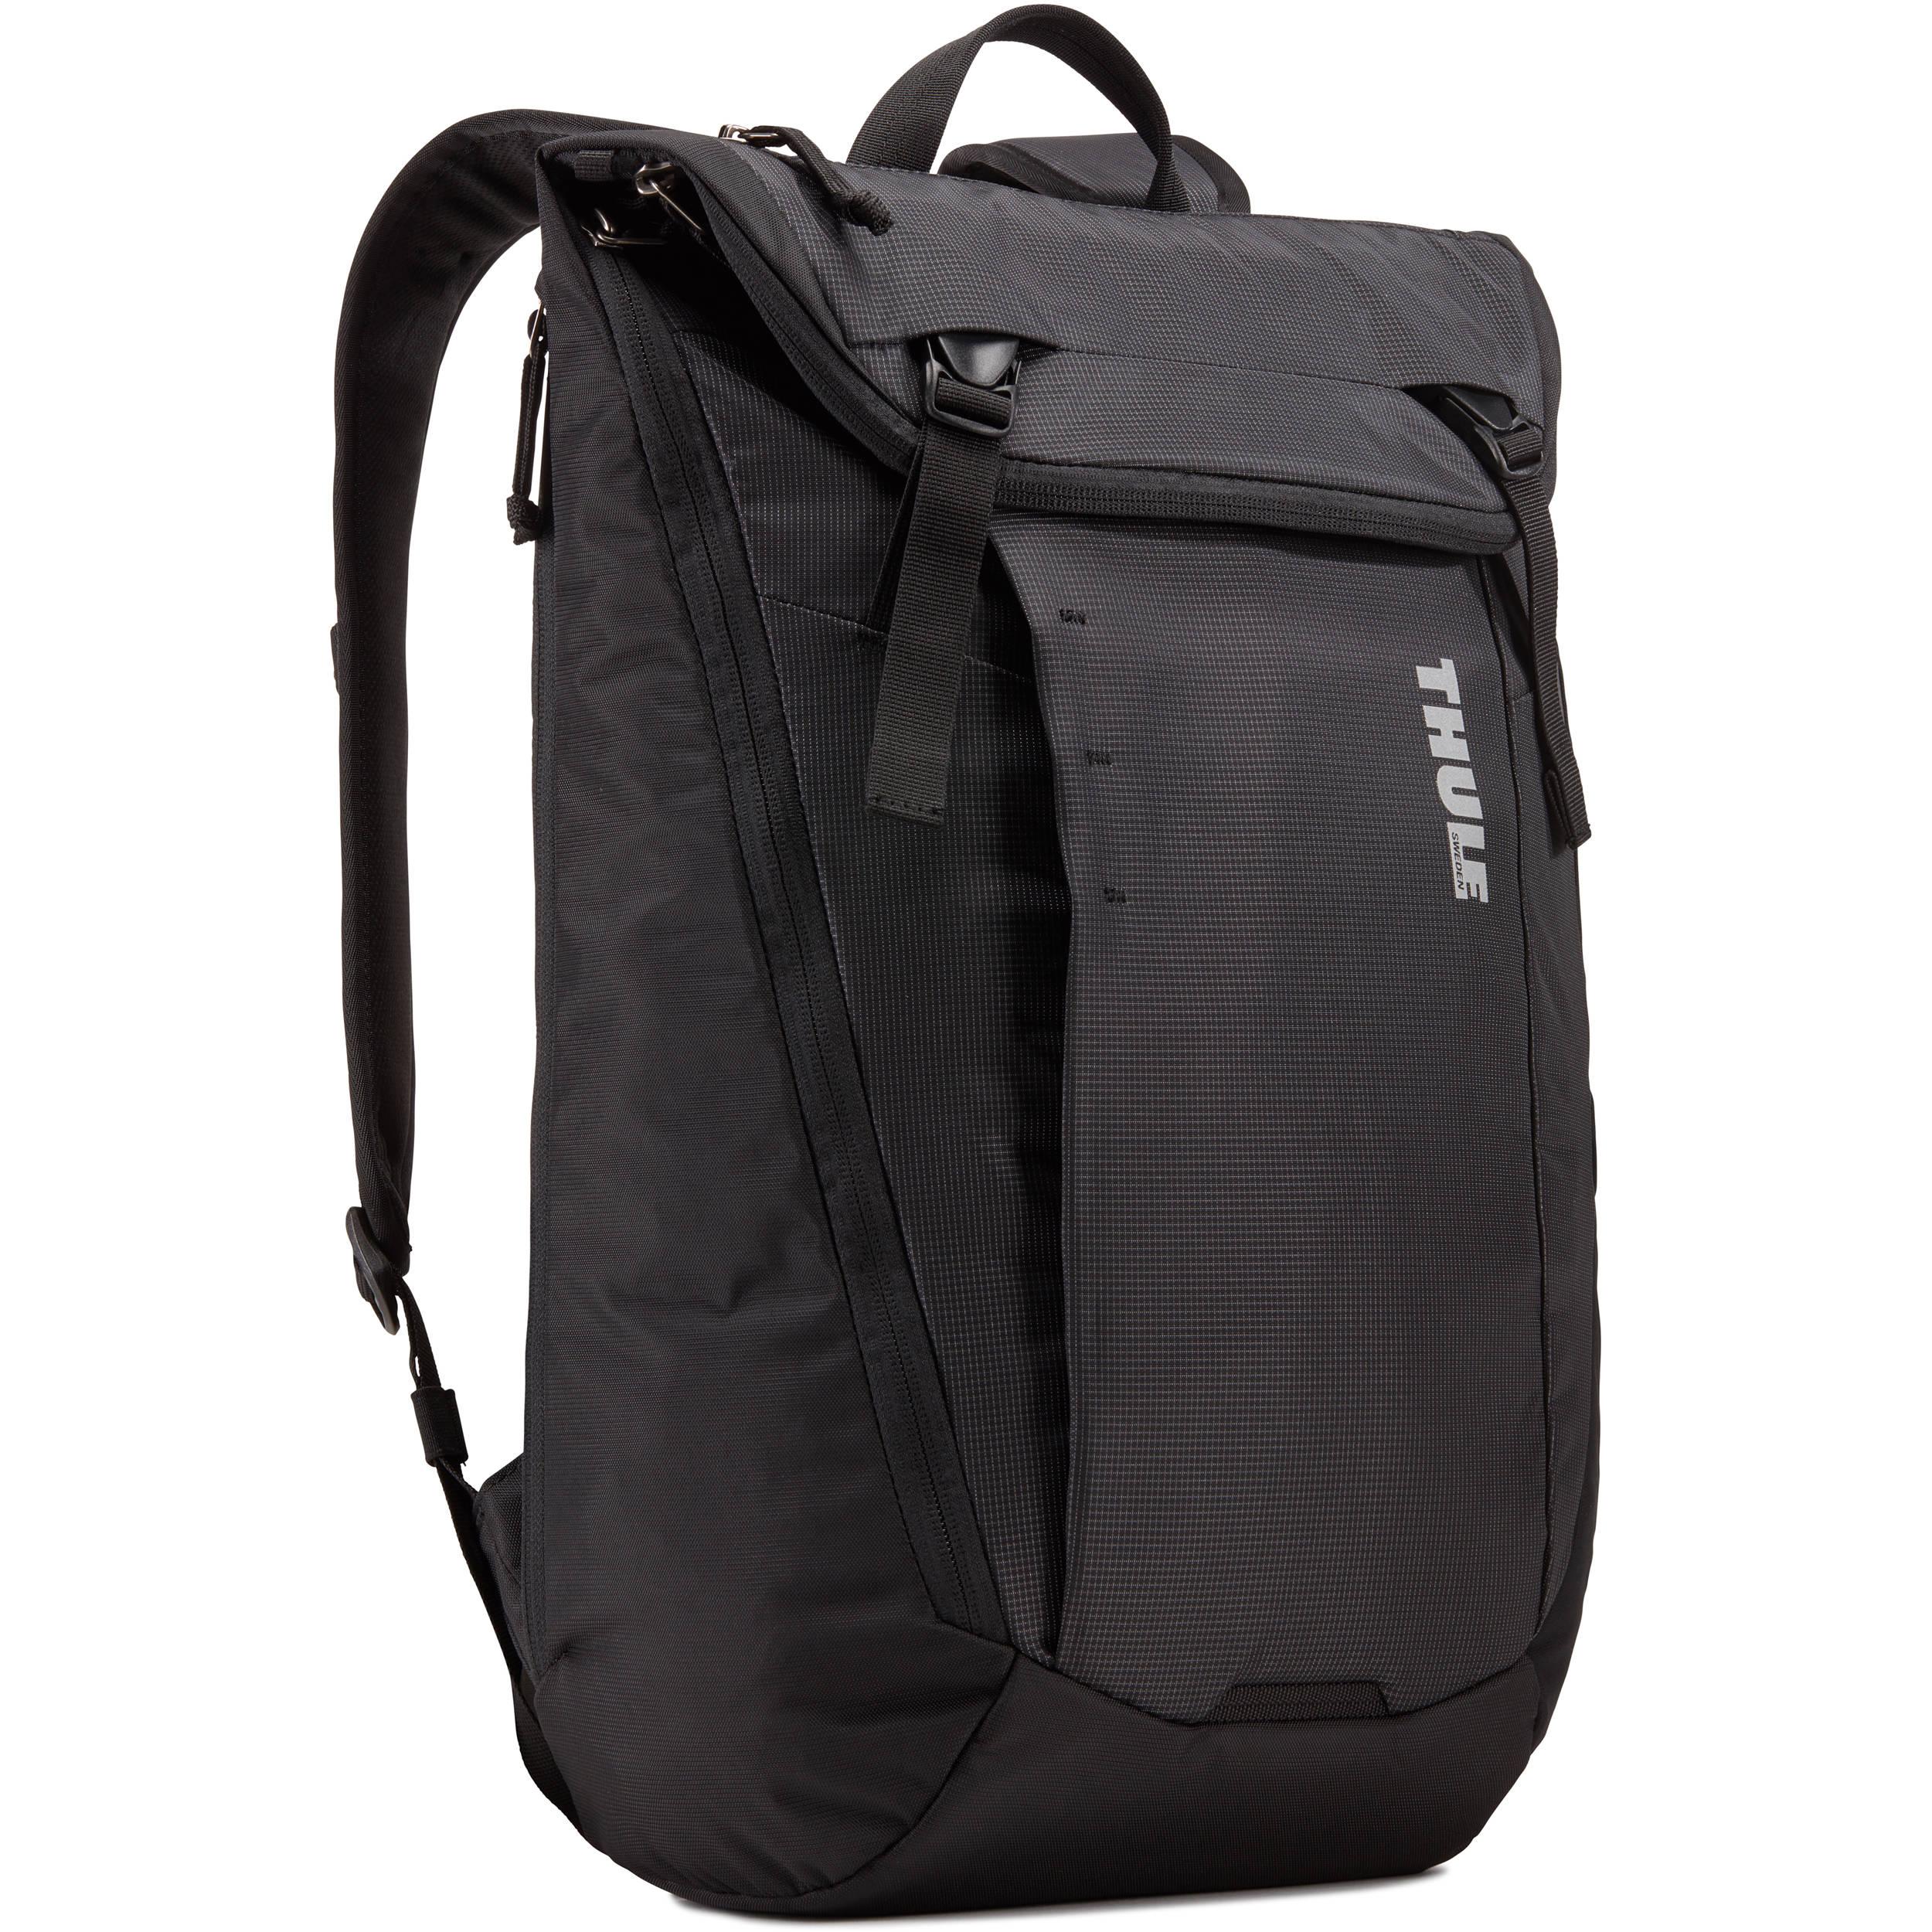 6302561b8d81 Thule EnRoute 20L Backpack (Black) 3203591 B H Photo Video